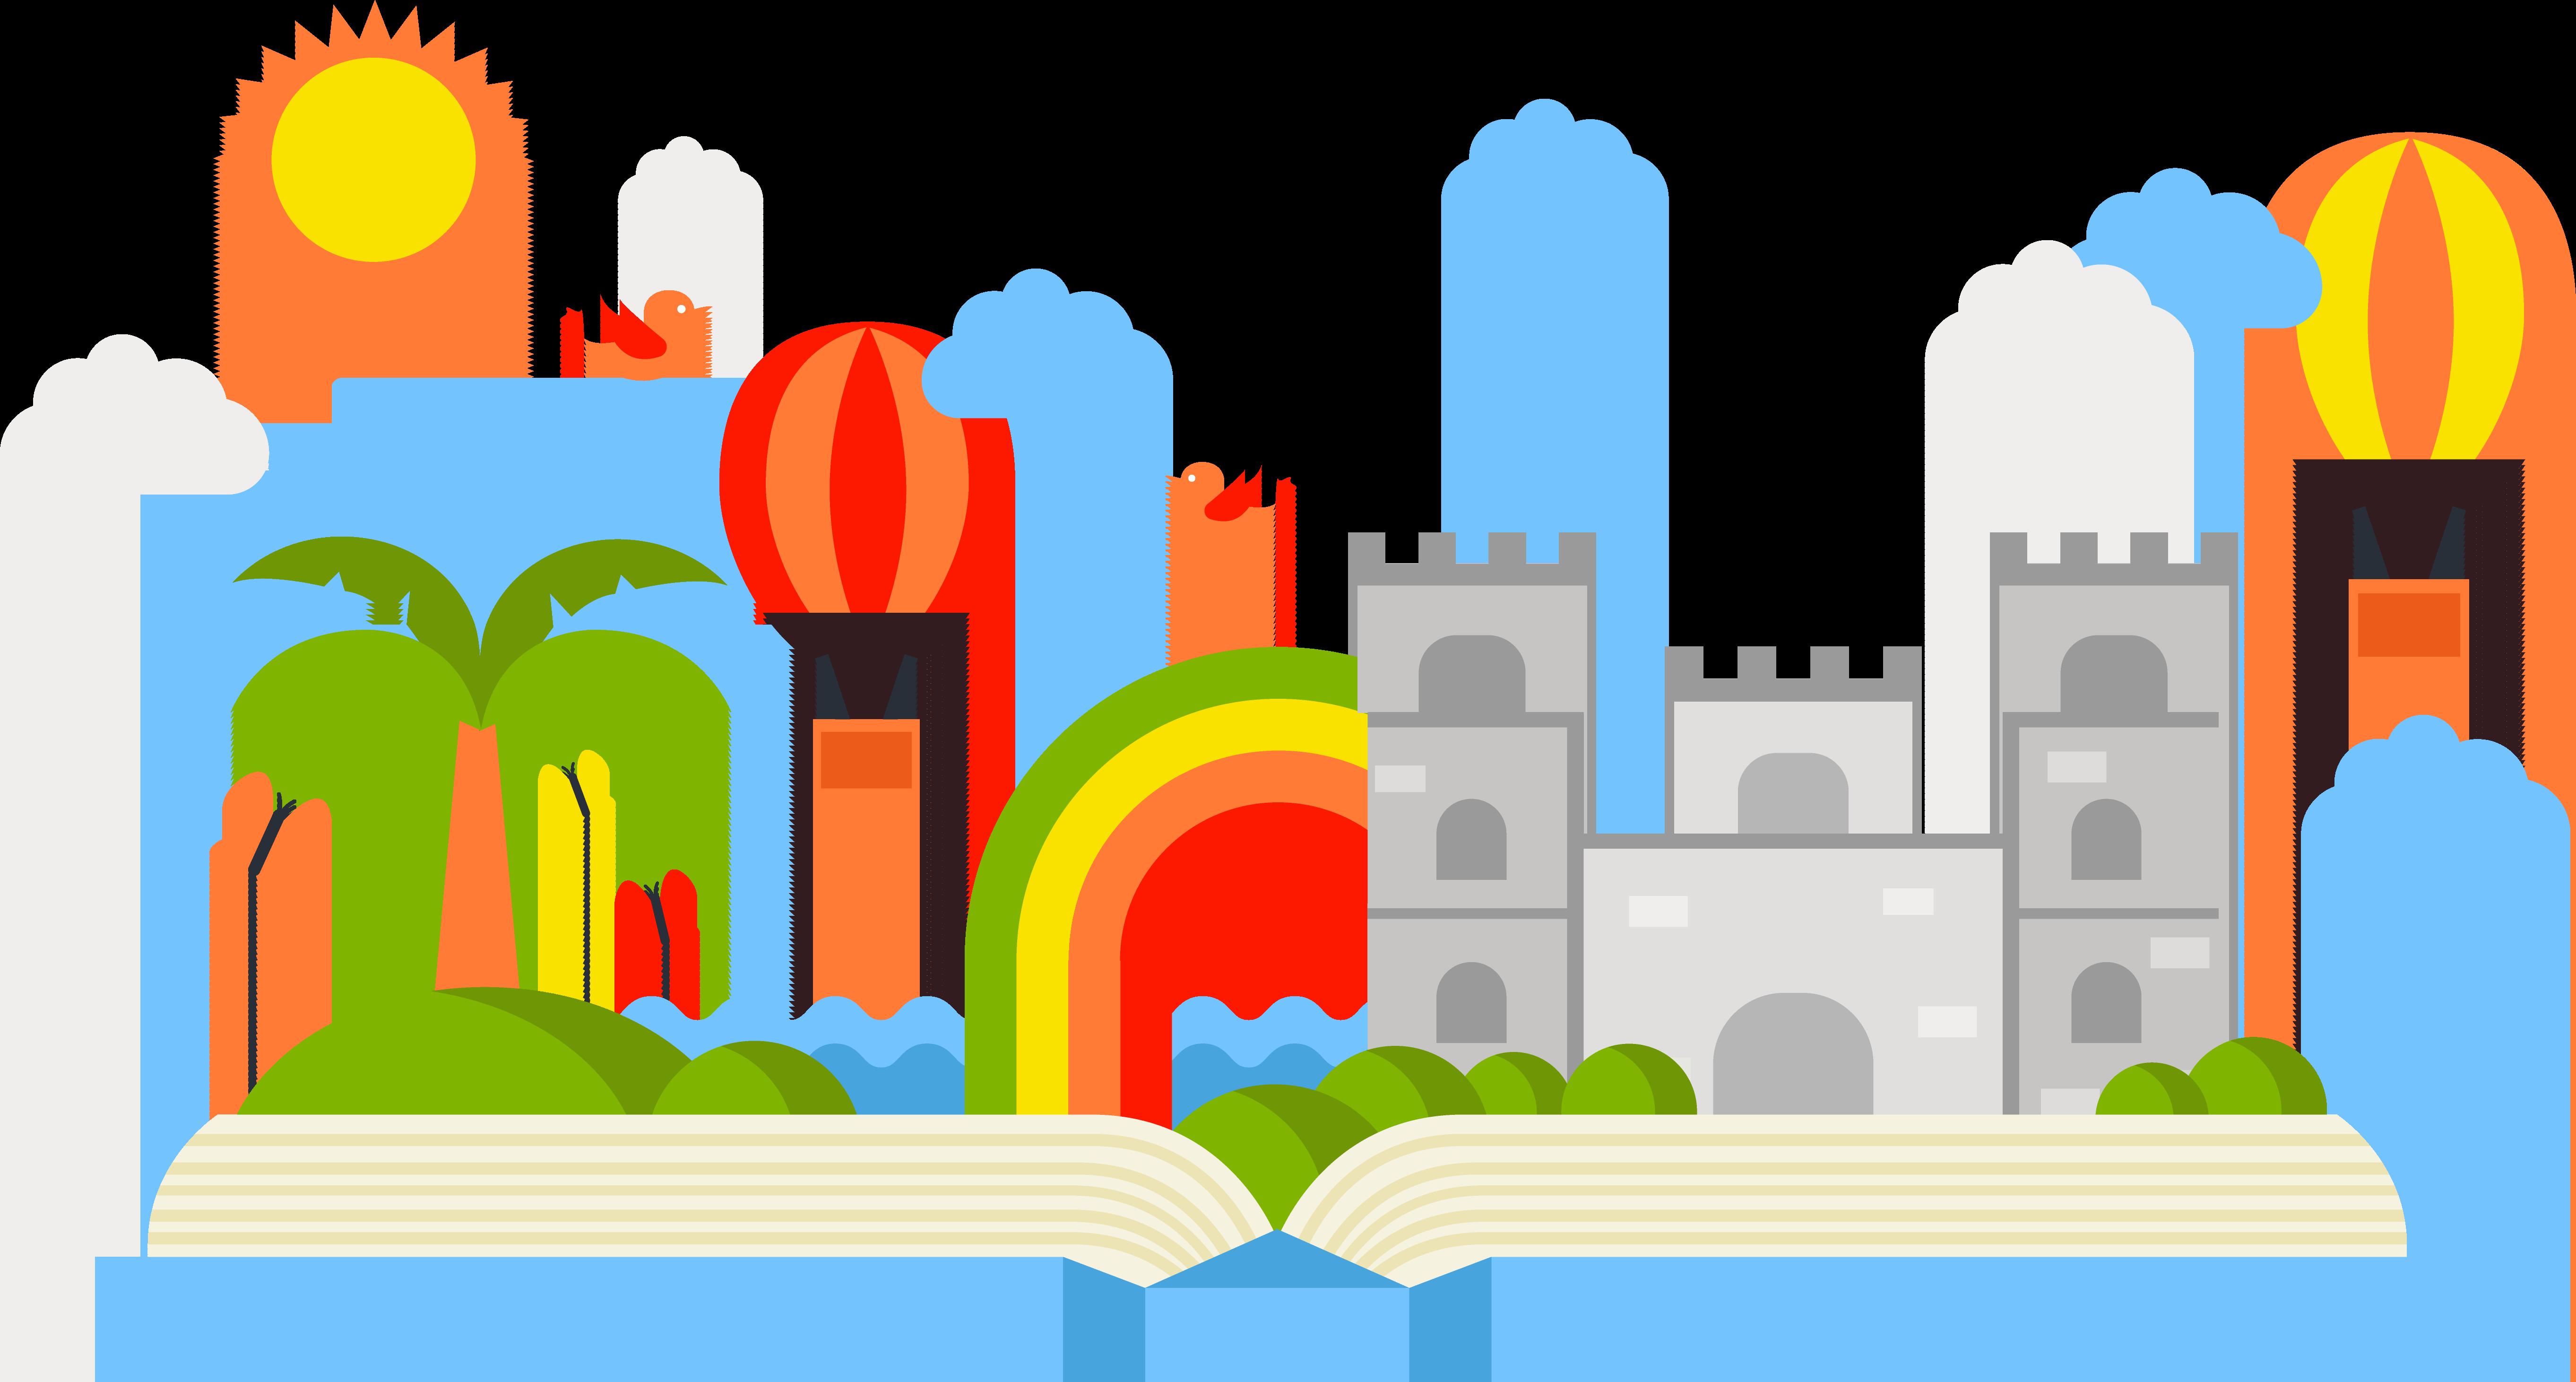 Fairytale clipart fiction book. Storytelling fairy tale illustration